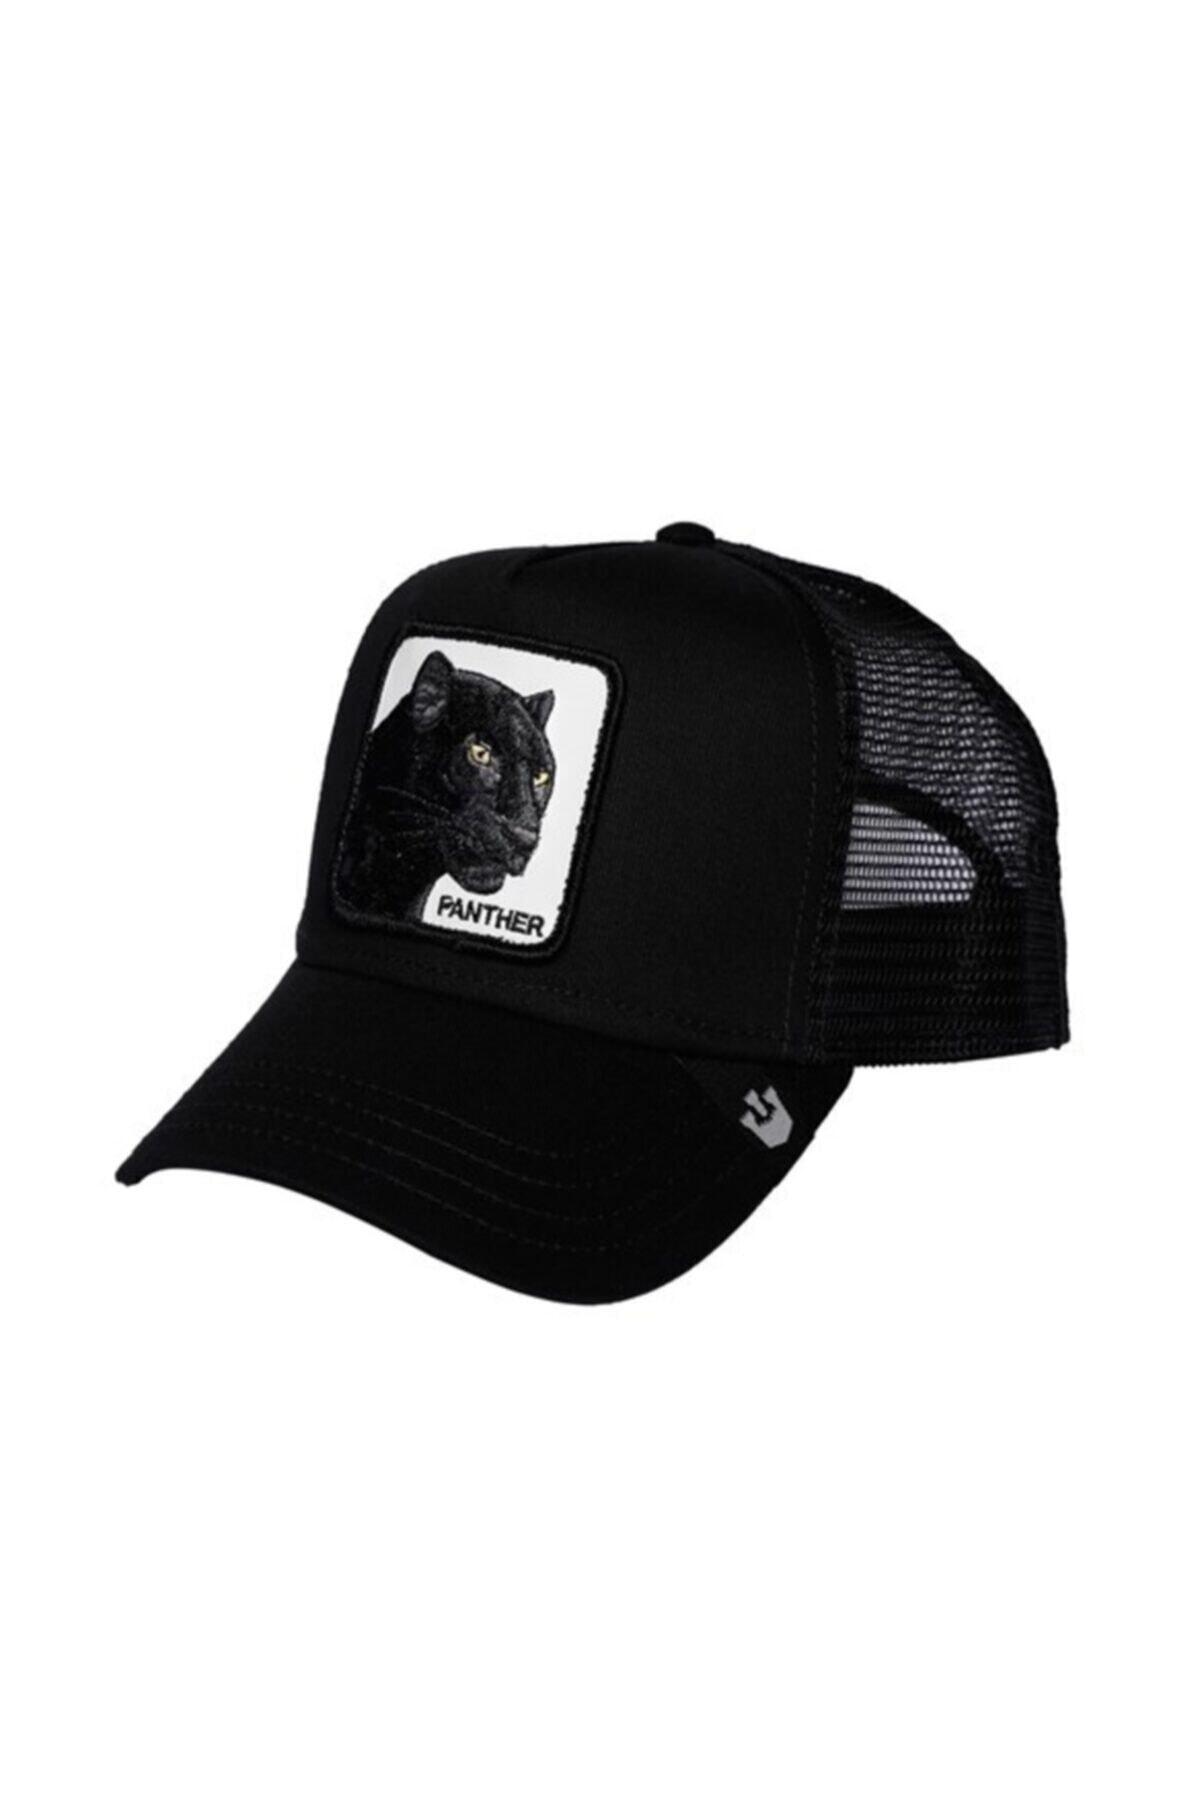 Goorin Bros Unisex Siyah Panther Şapka 2